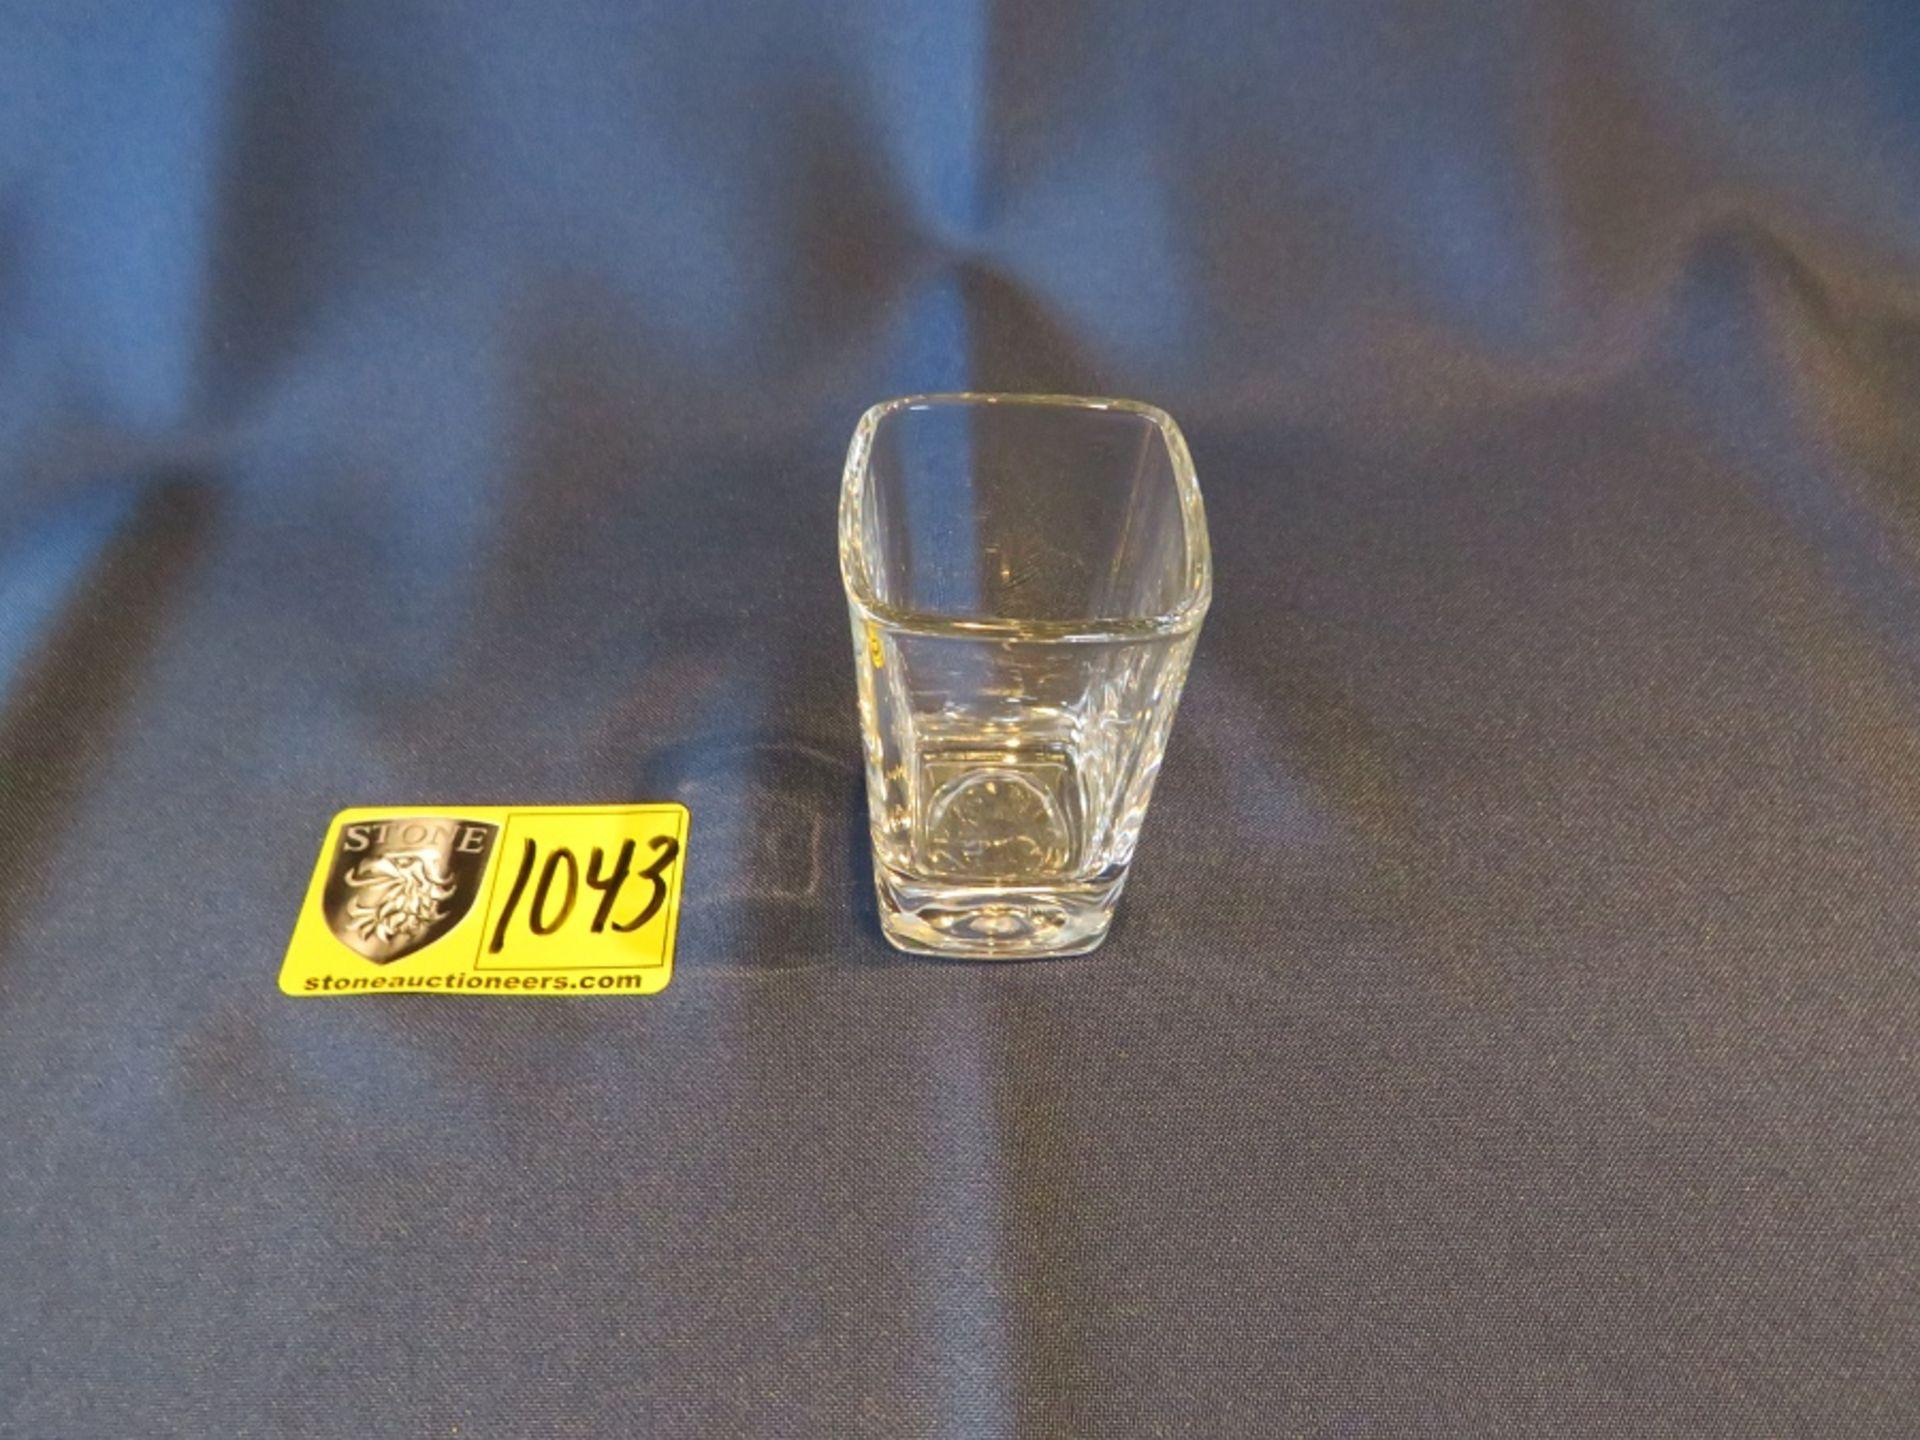 Lot 1043 - SHOT GLASS TALL SQUARE 2.75 OZ